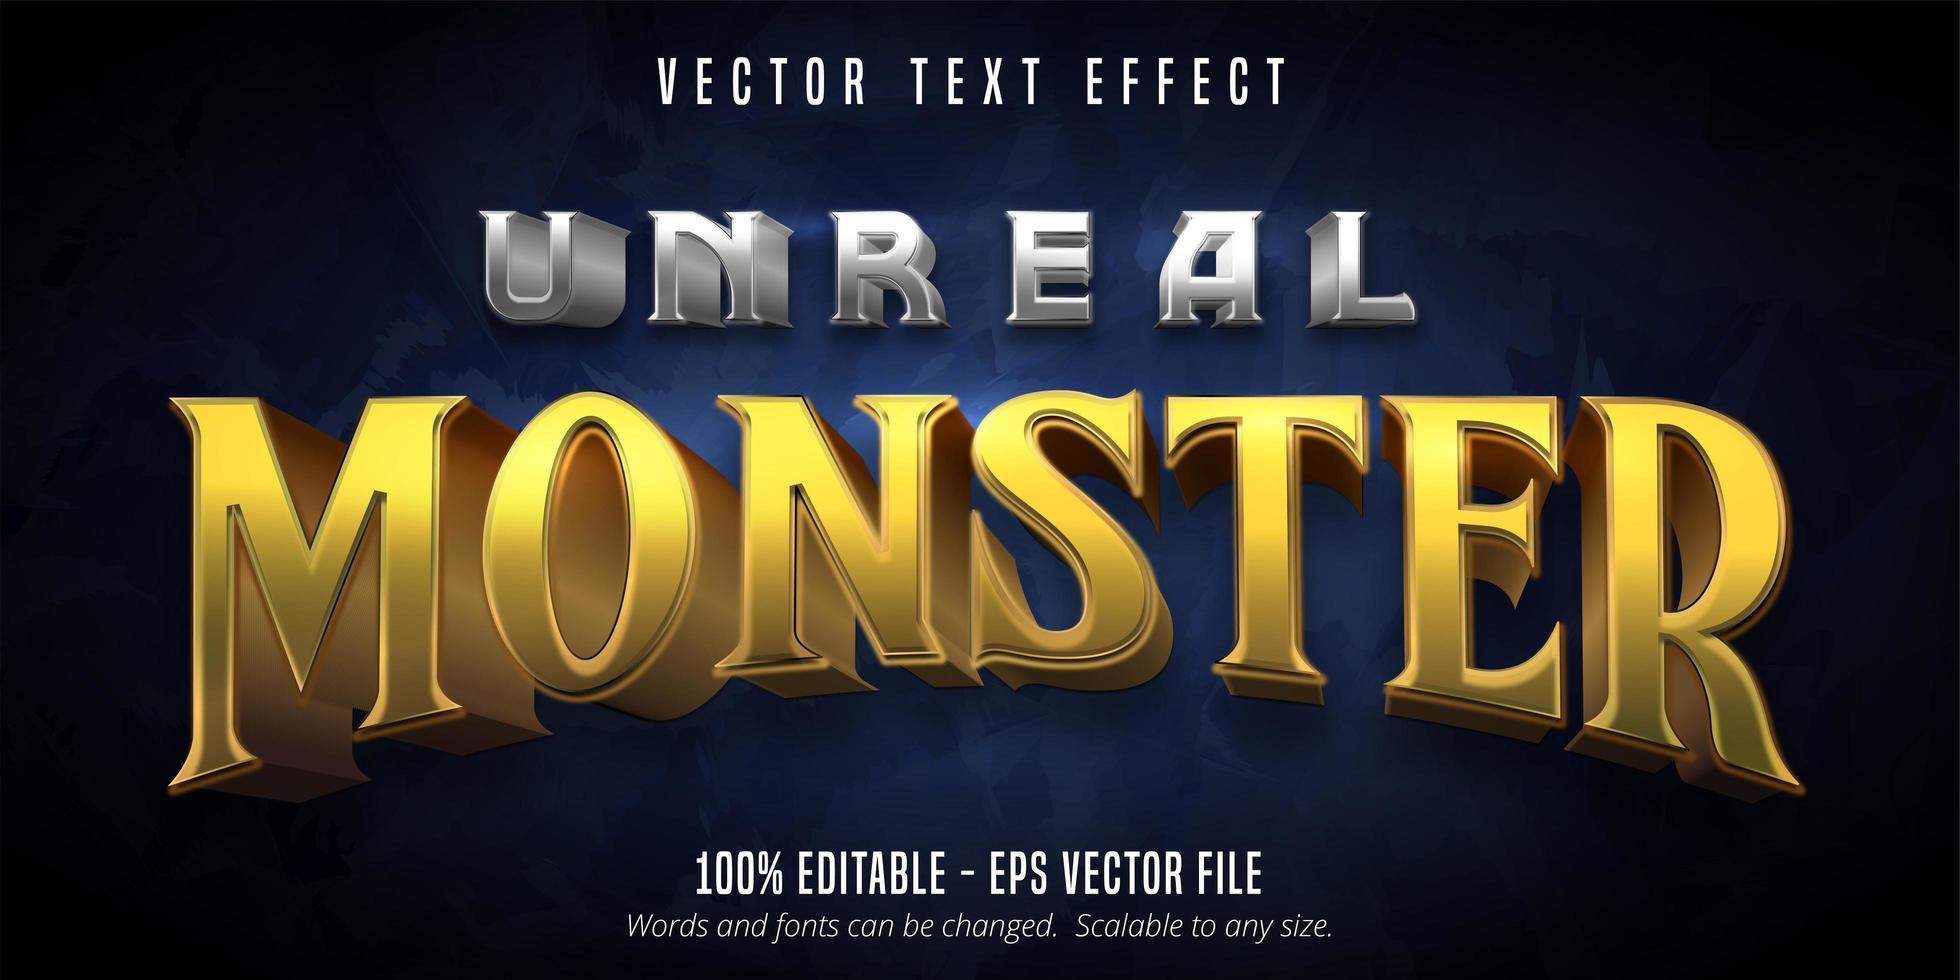 oerkligt monster metallic spel stil effekt vektor